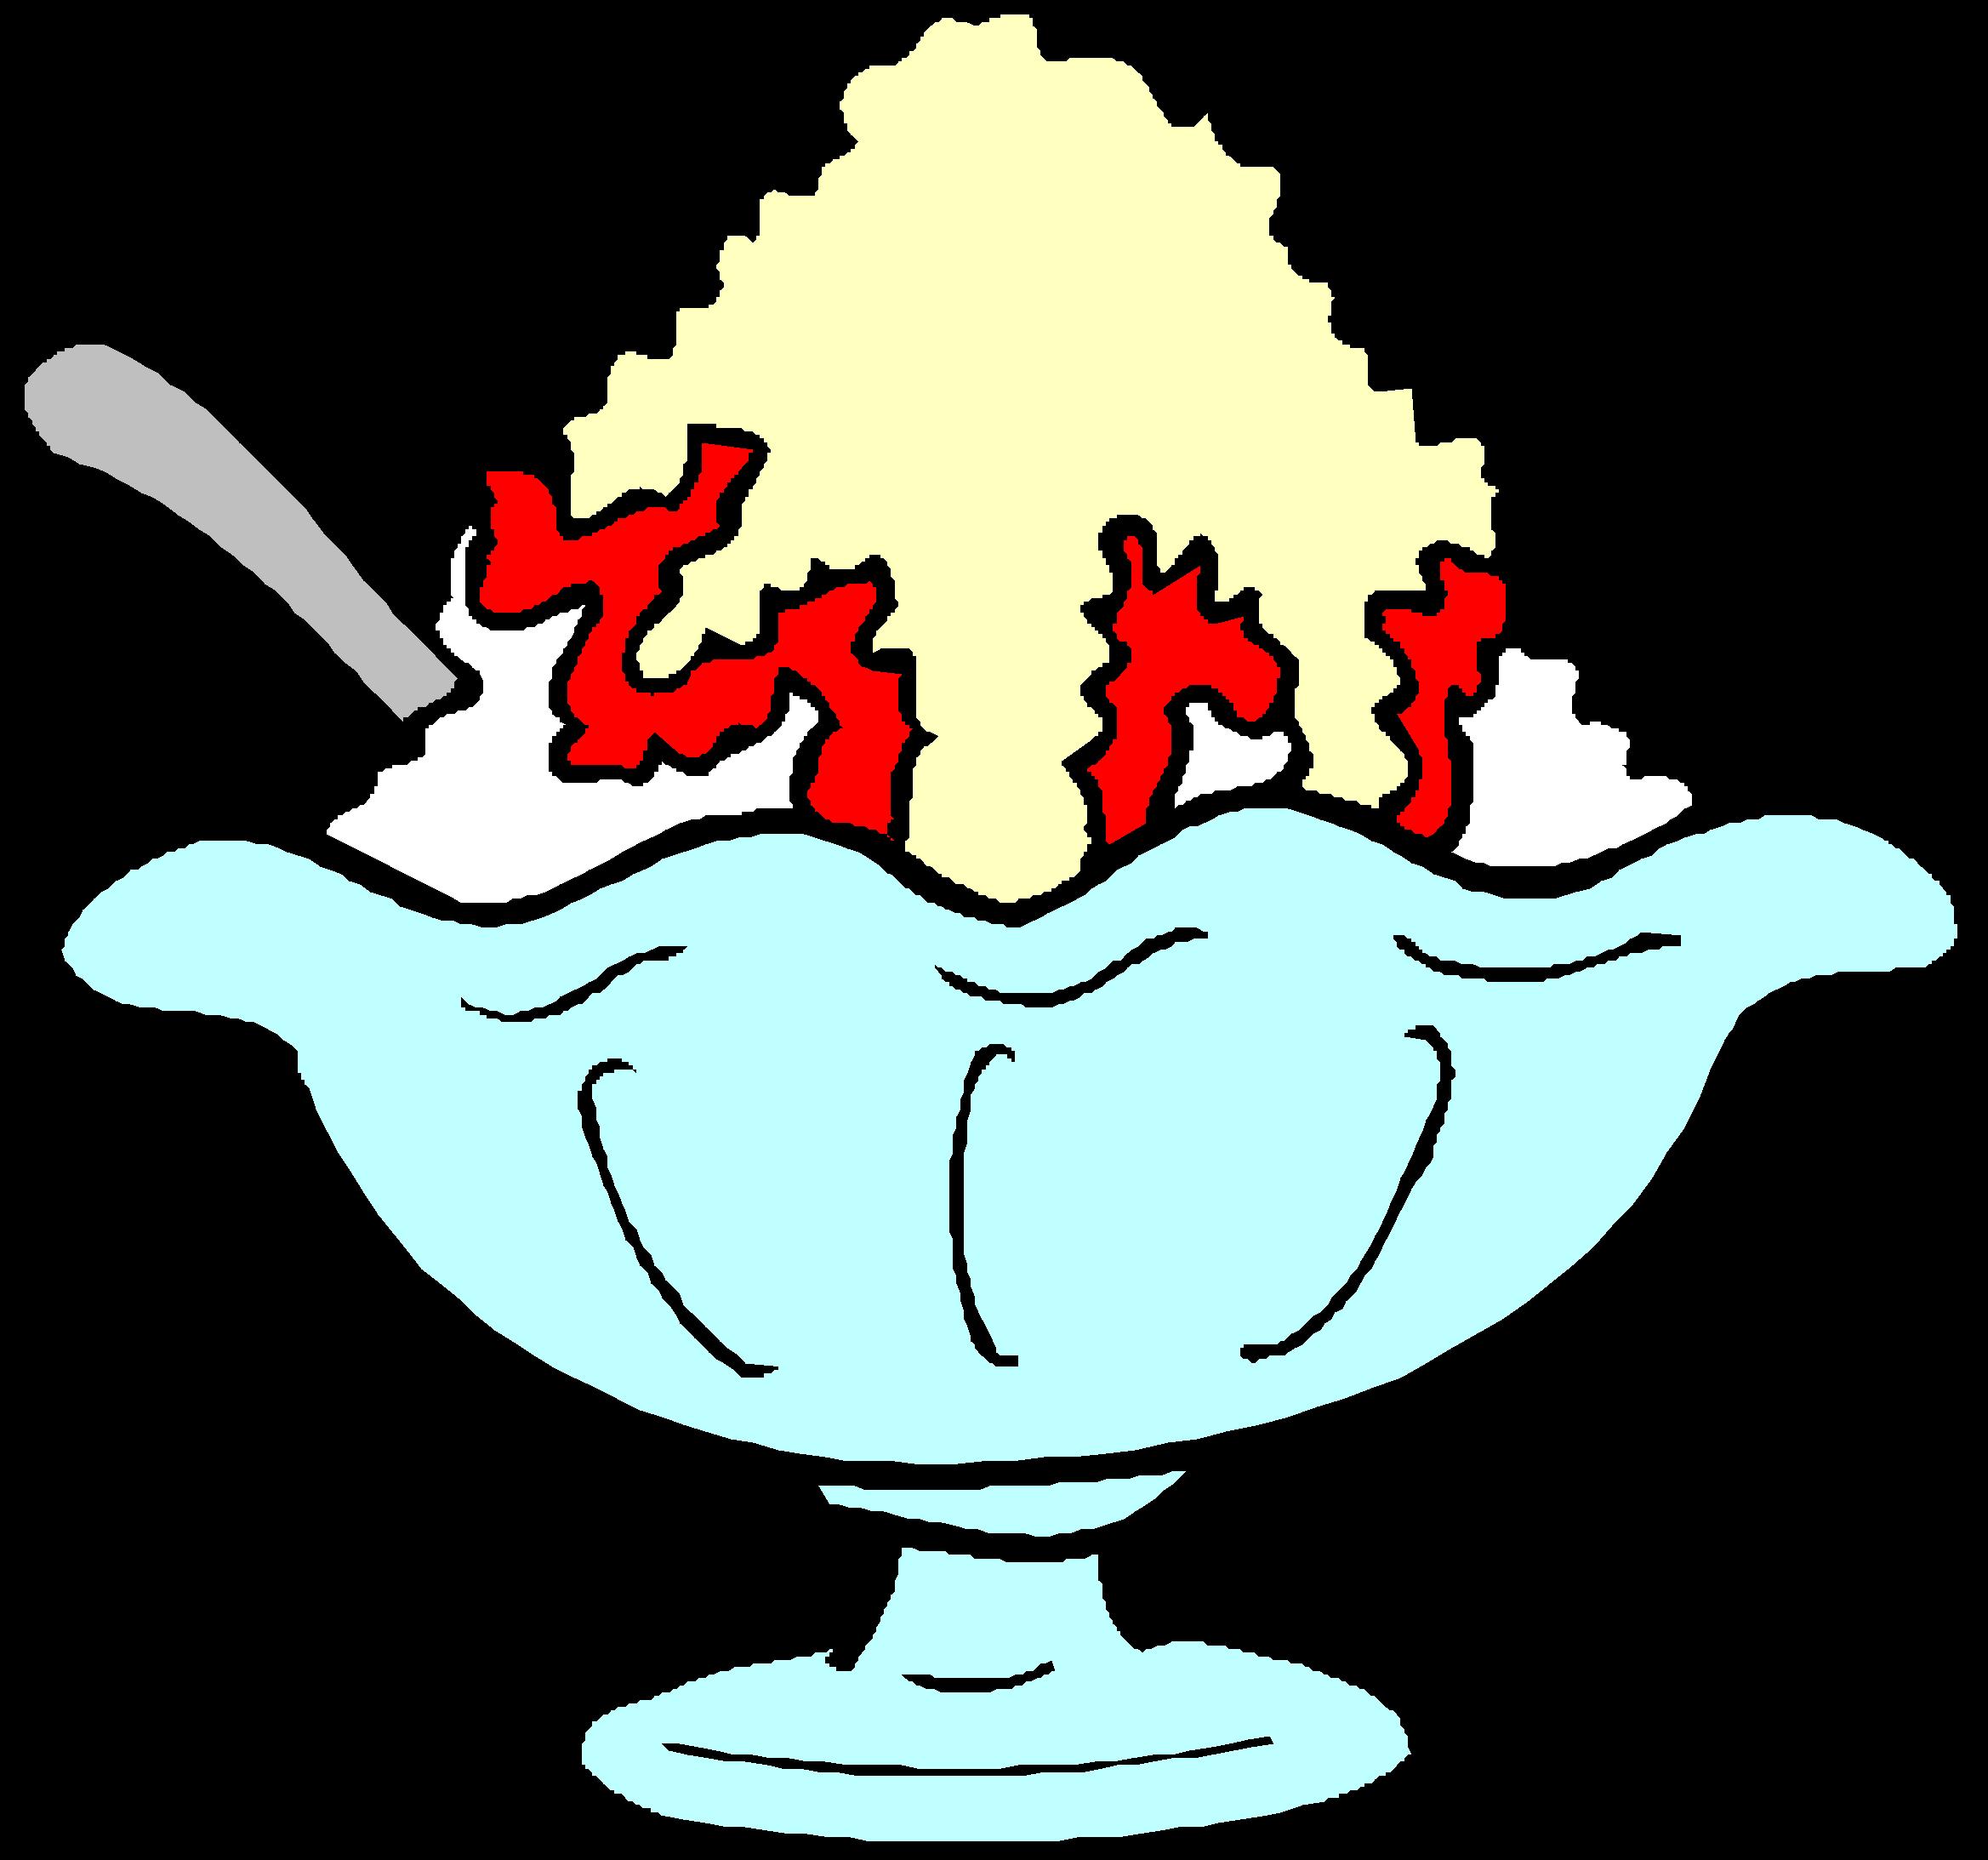 Ice Cream Sundae Bowl Template Ice Cream Sundae Template